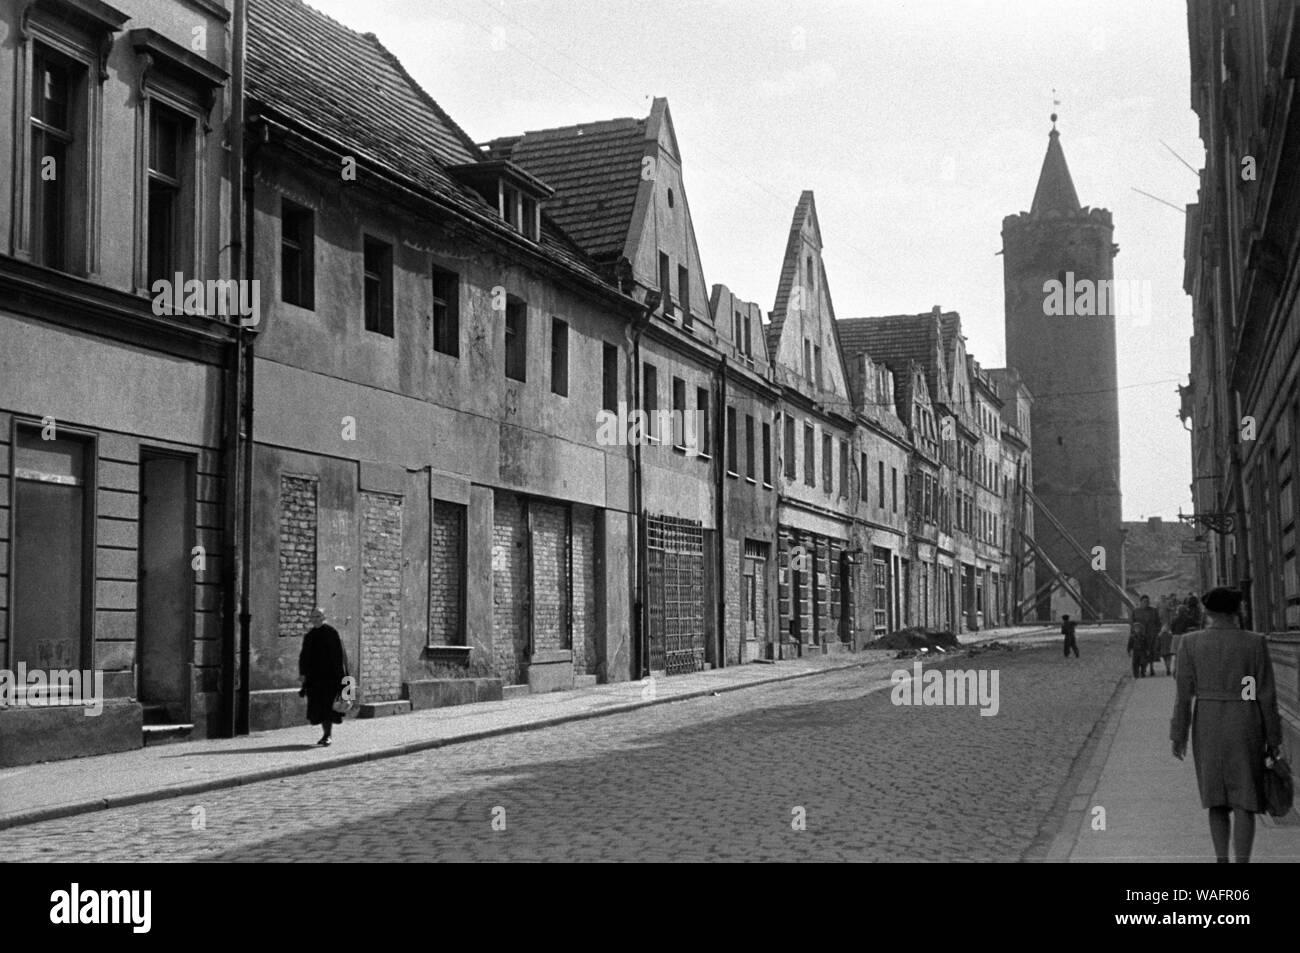 Paczkow, 05.1957. Las casas. Fot. Wojciech Plewinski/FORO Foto de stock